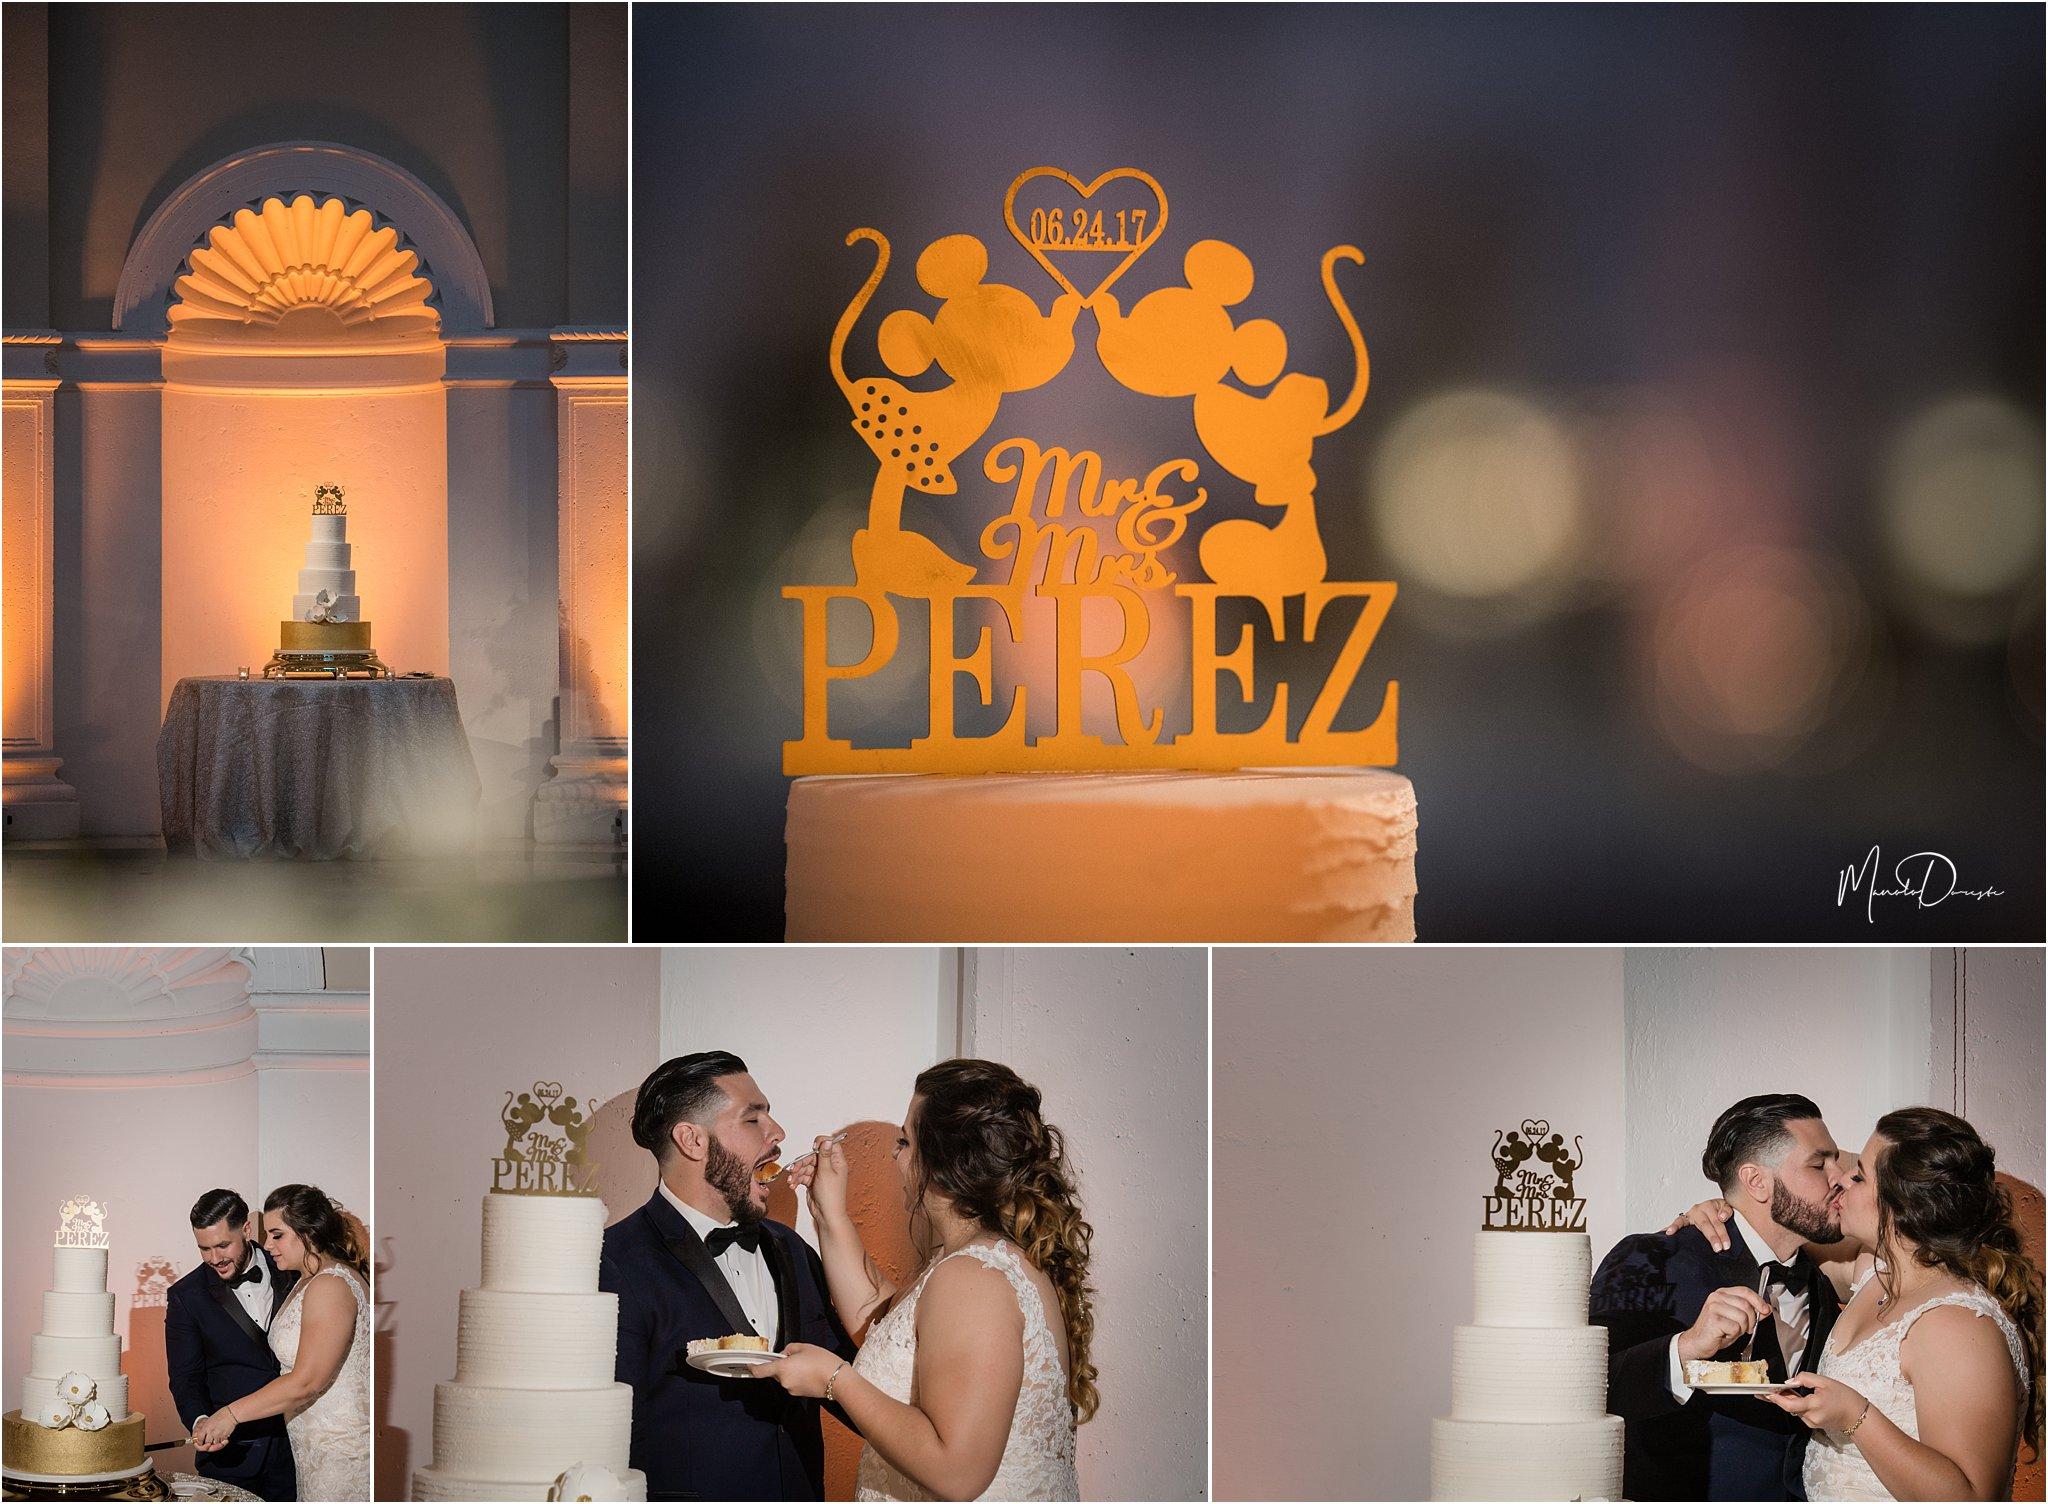 0377_ManoloDoreste_InFocusStudios_Wedding_Family_Photography_Miami_MiamiPhotographer.jpg